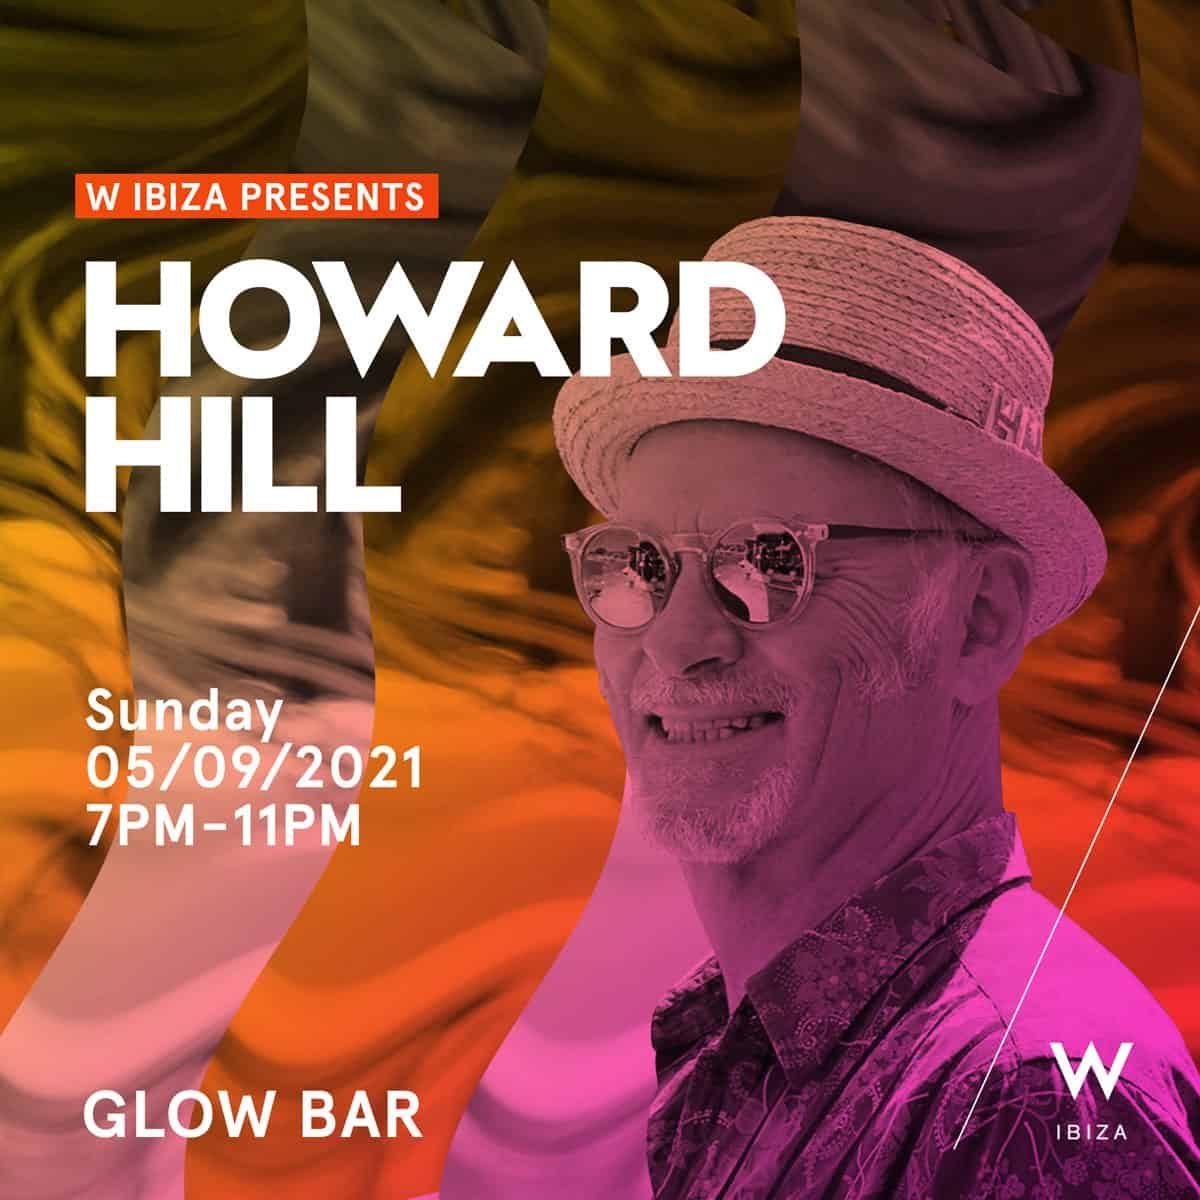 w-ibiza-howard-hill-2021-welcometoibiza